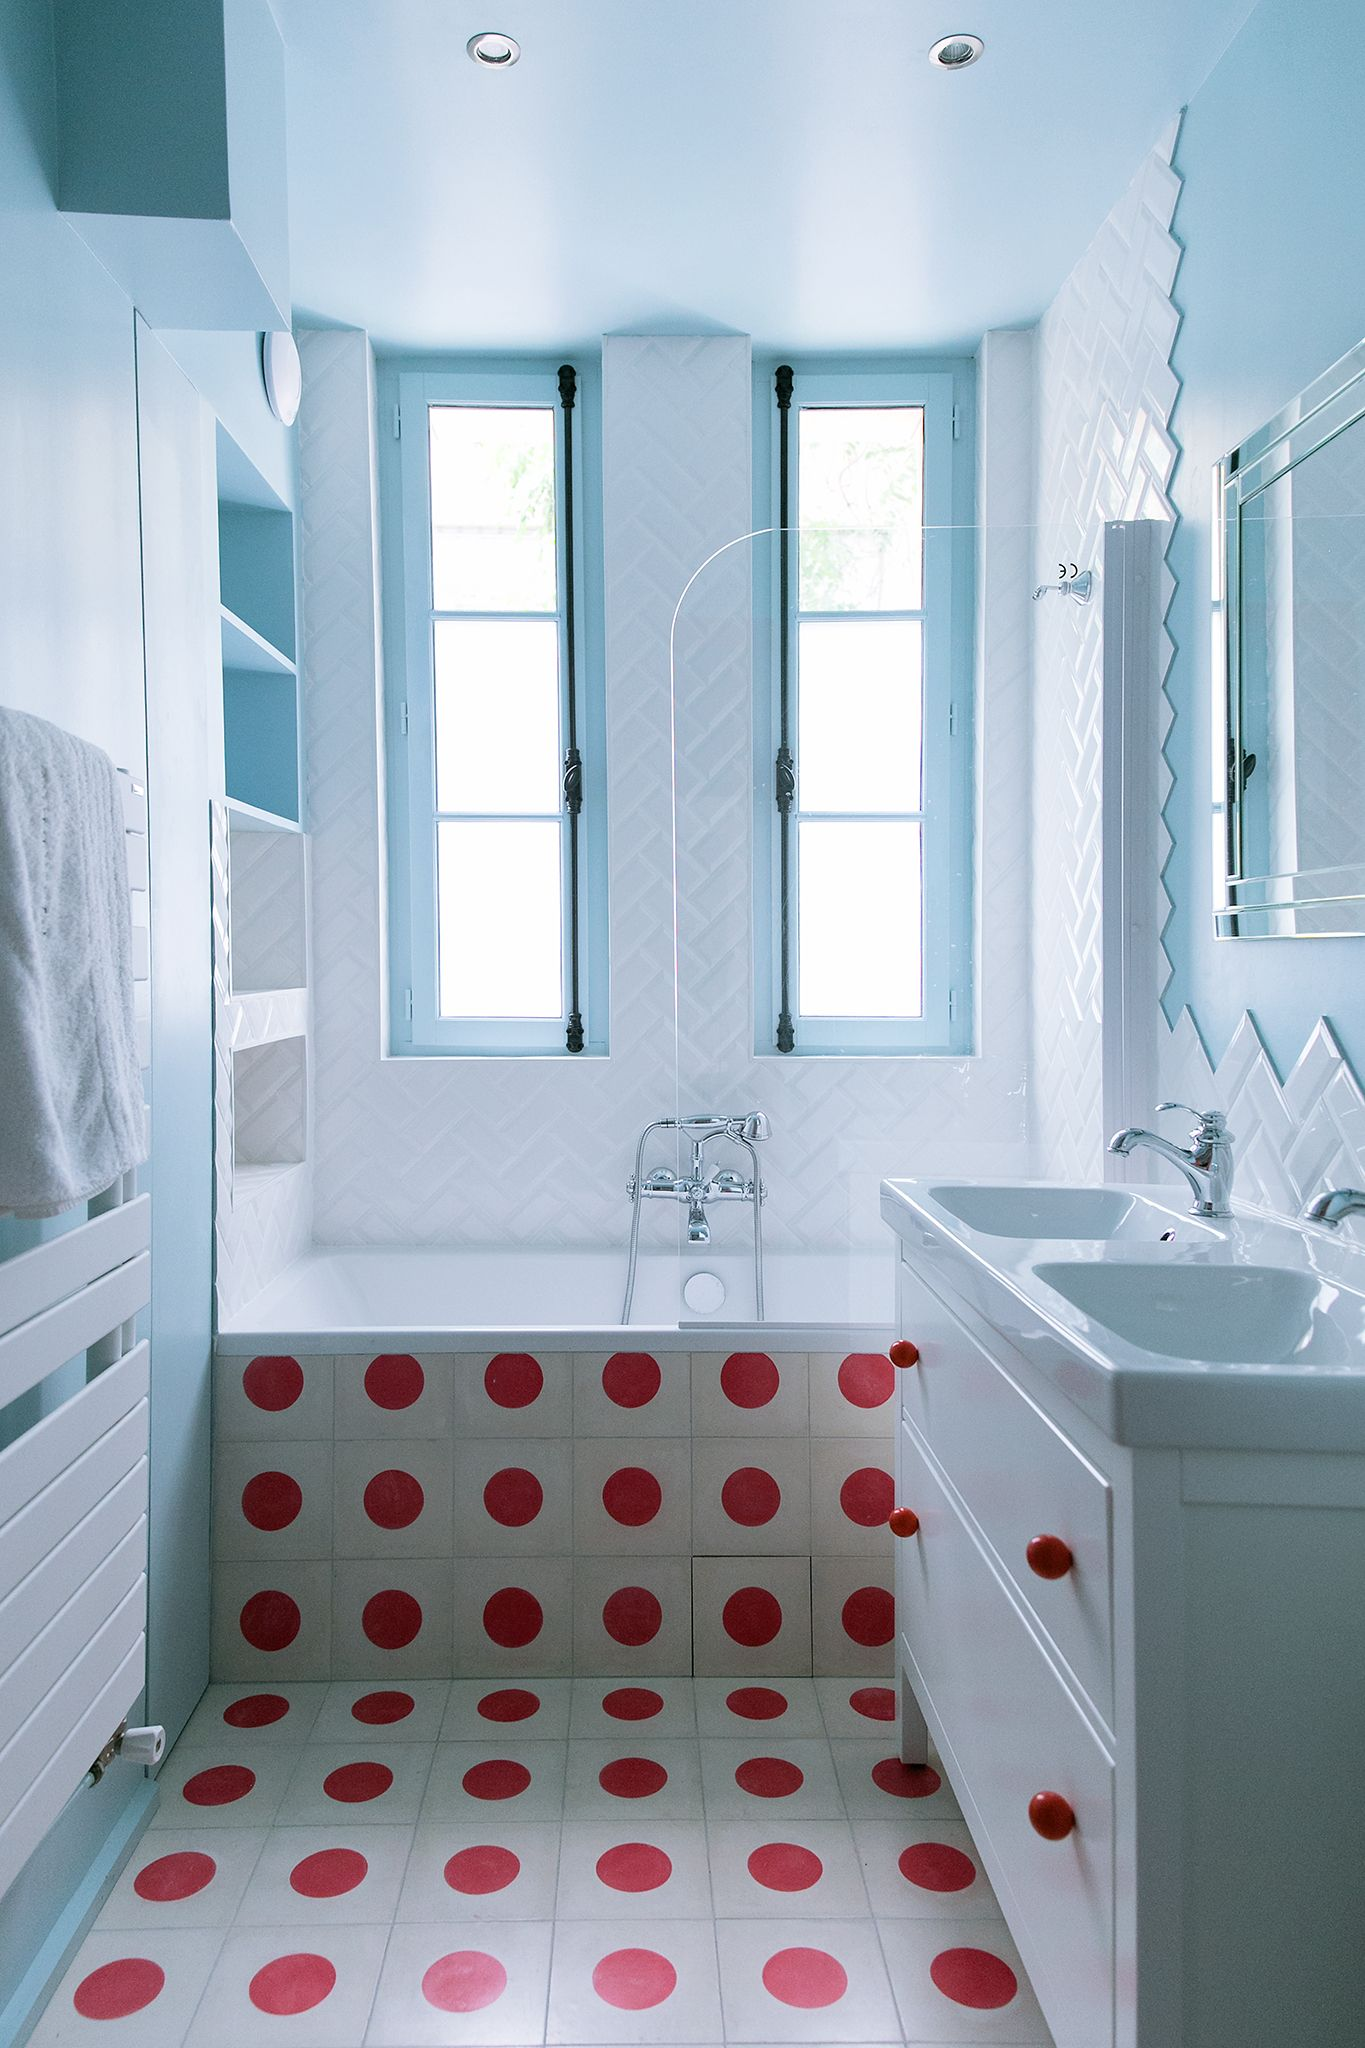 Eugene Manuel Gcg Architectes Bathroom Design Small Retro